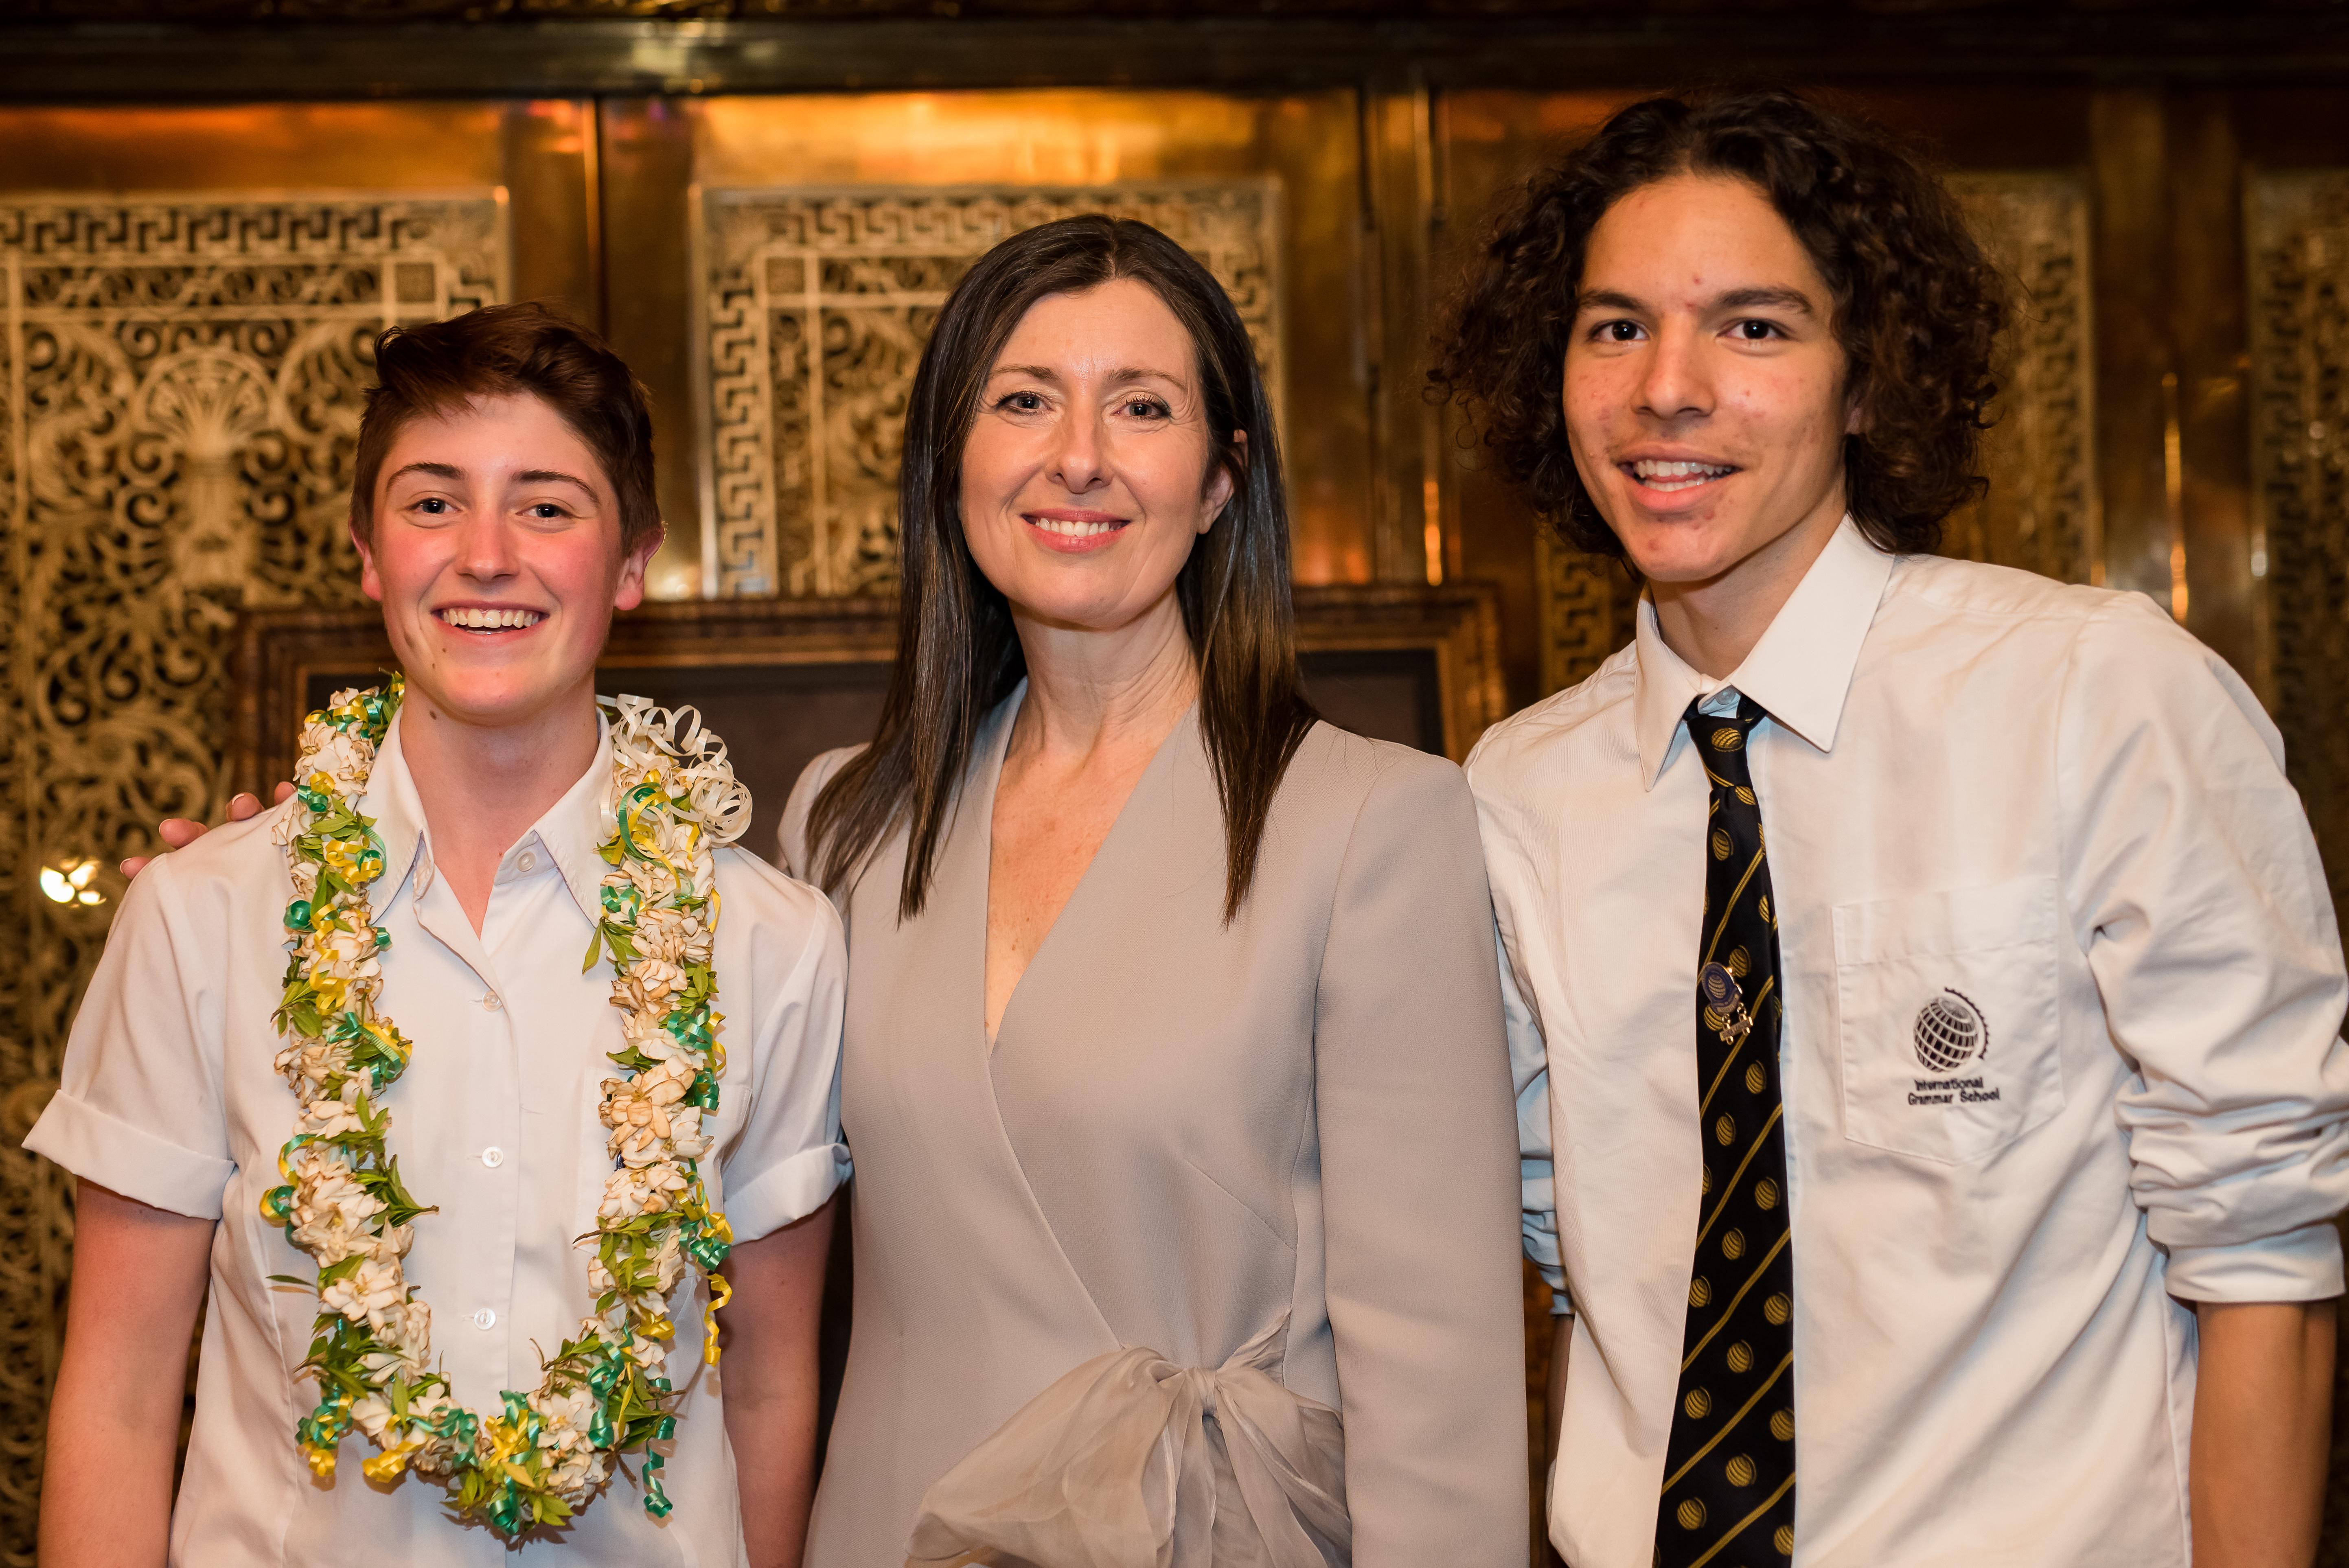 IGS 2019 Head Girl Saskia Scott-Hickie and Head Boy Fadi Al Hatu with Principal Shauna Colnan